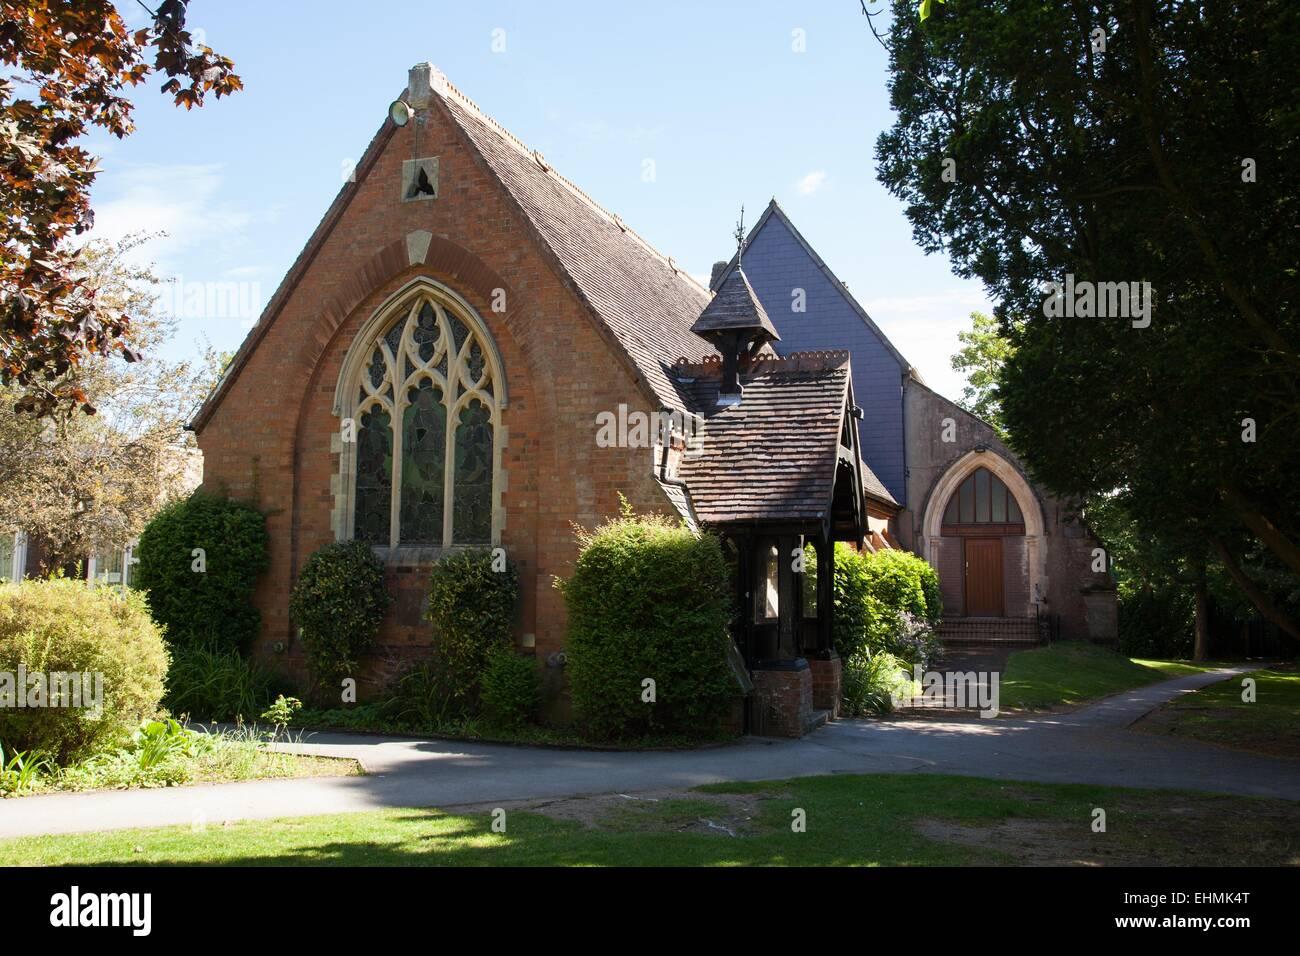 St Philips Church, Dorridge, nr Solihull, West Midlands - Stock Image